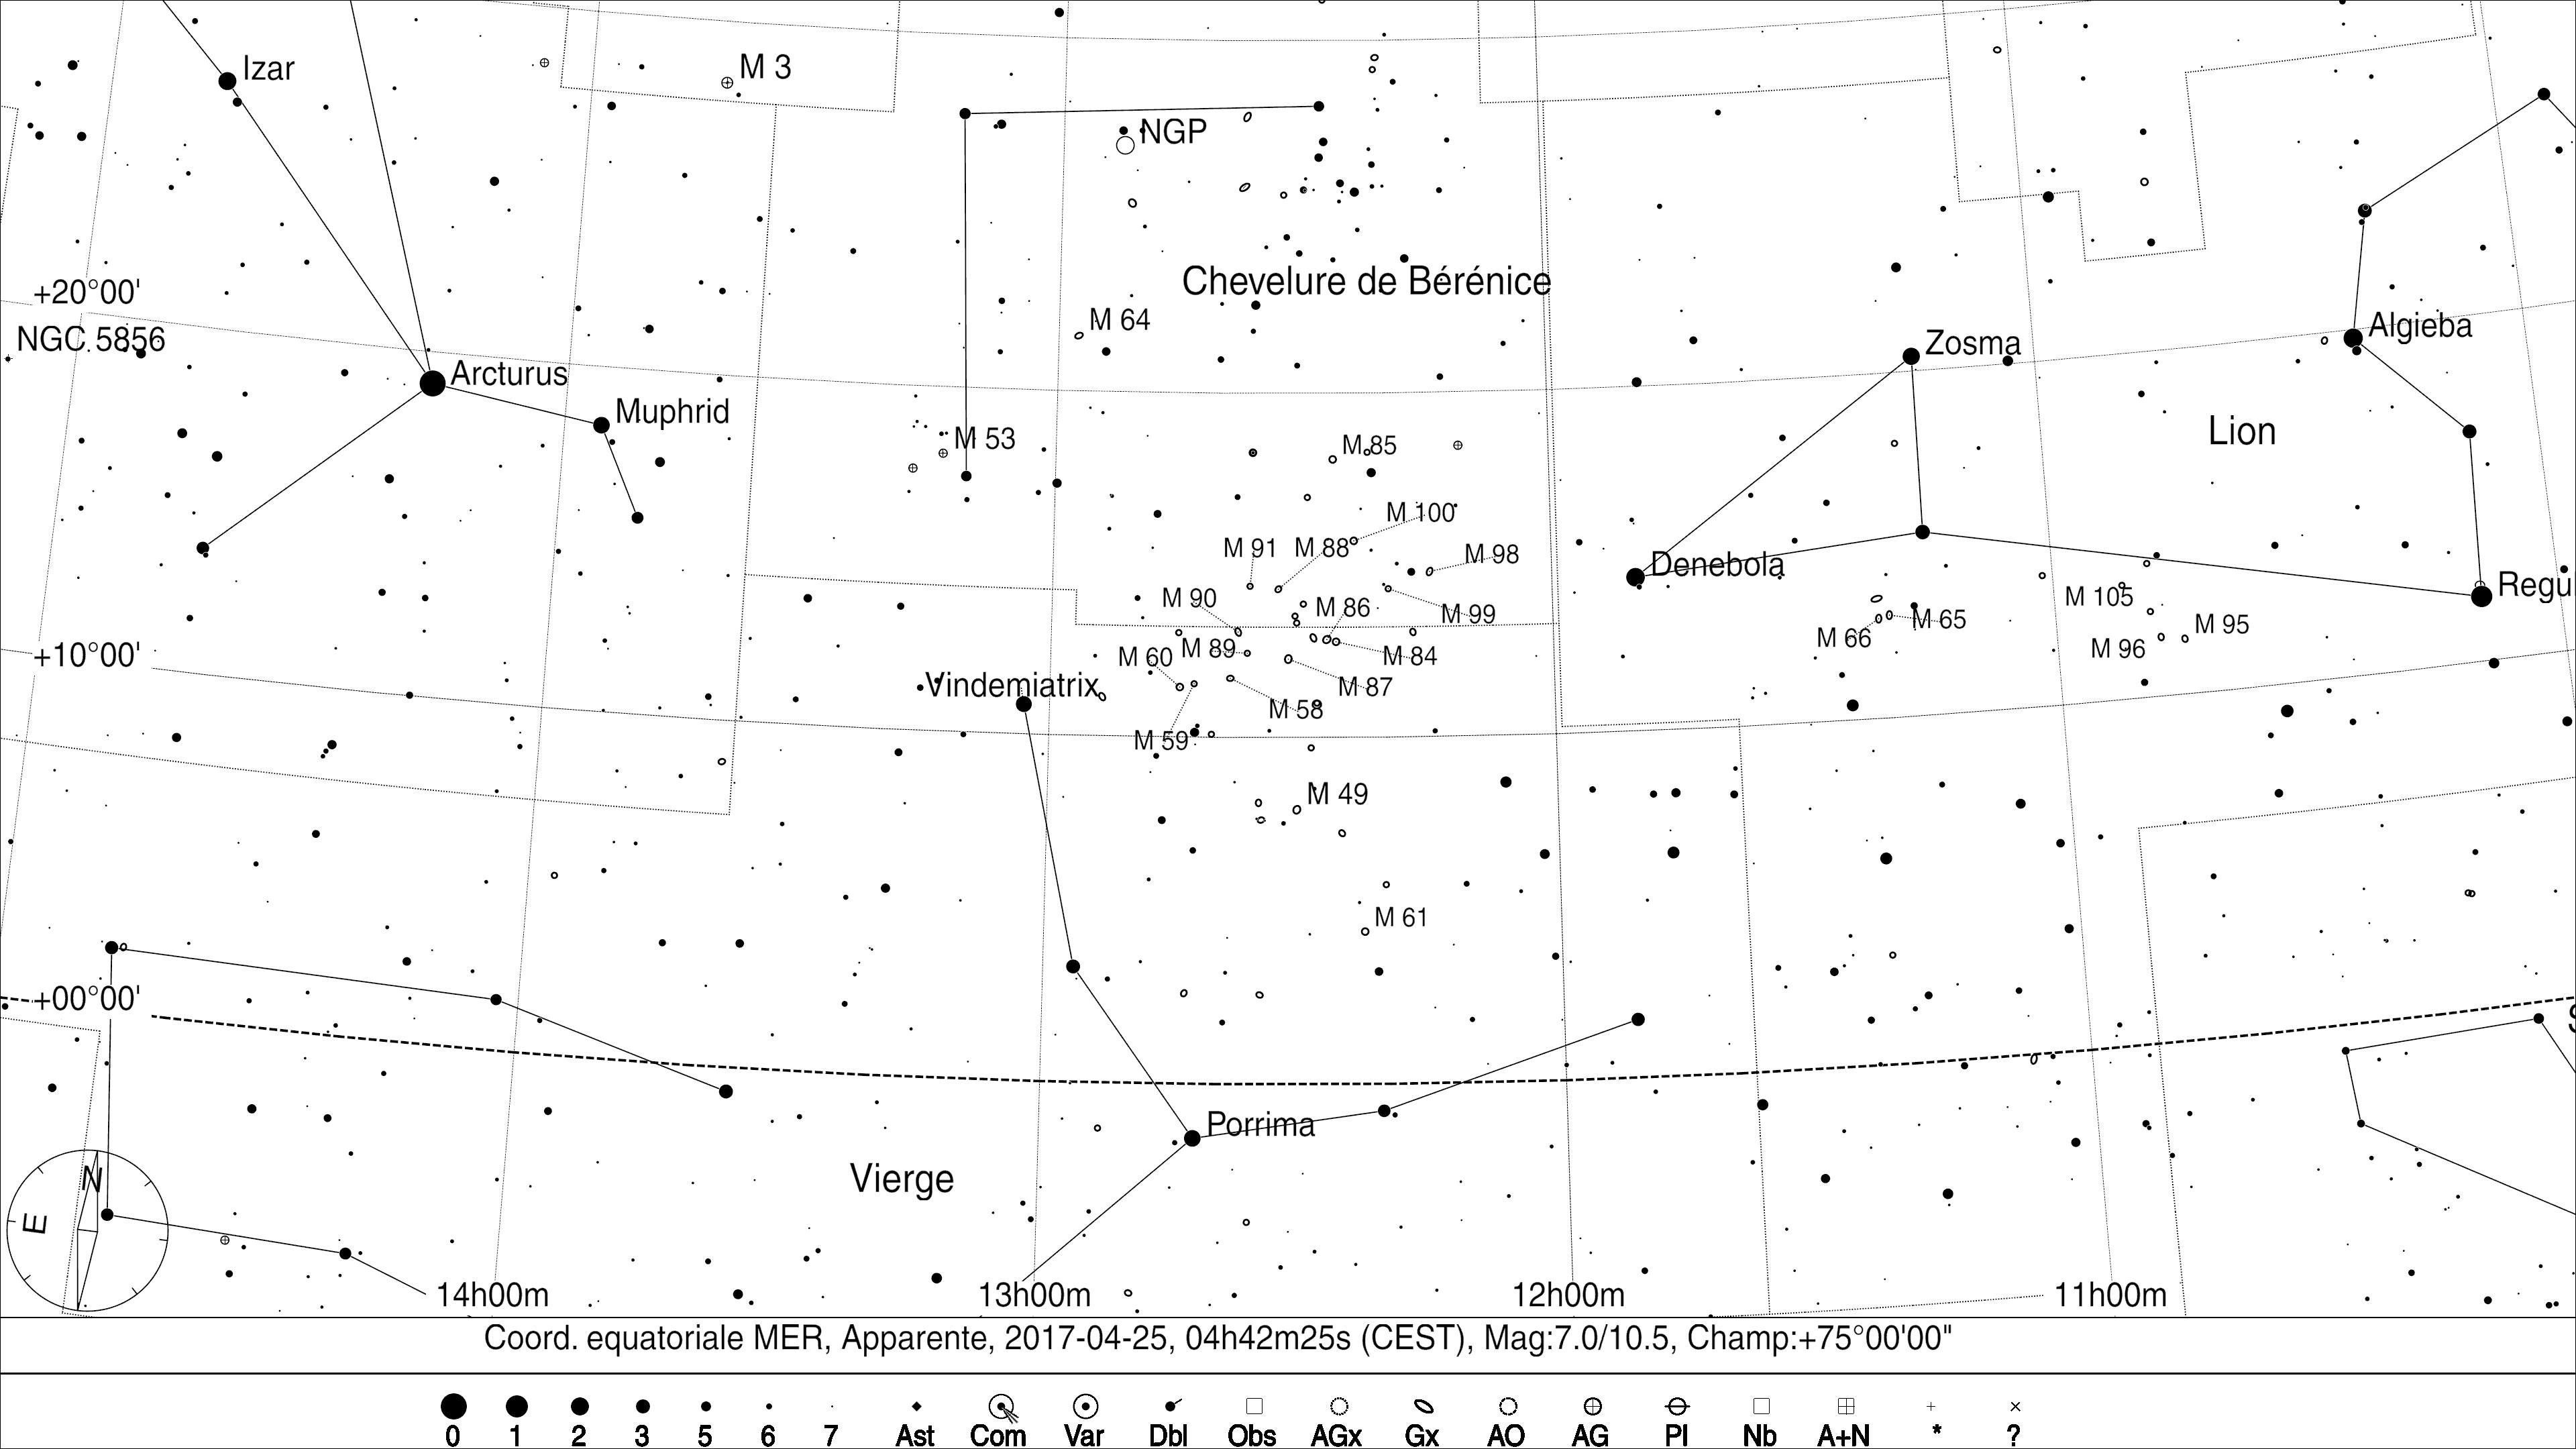 M87_75